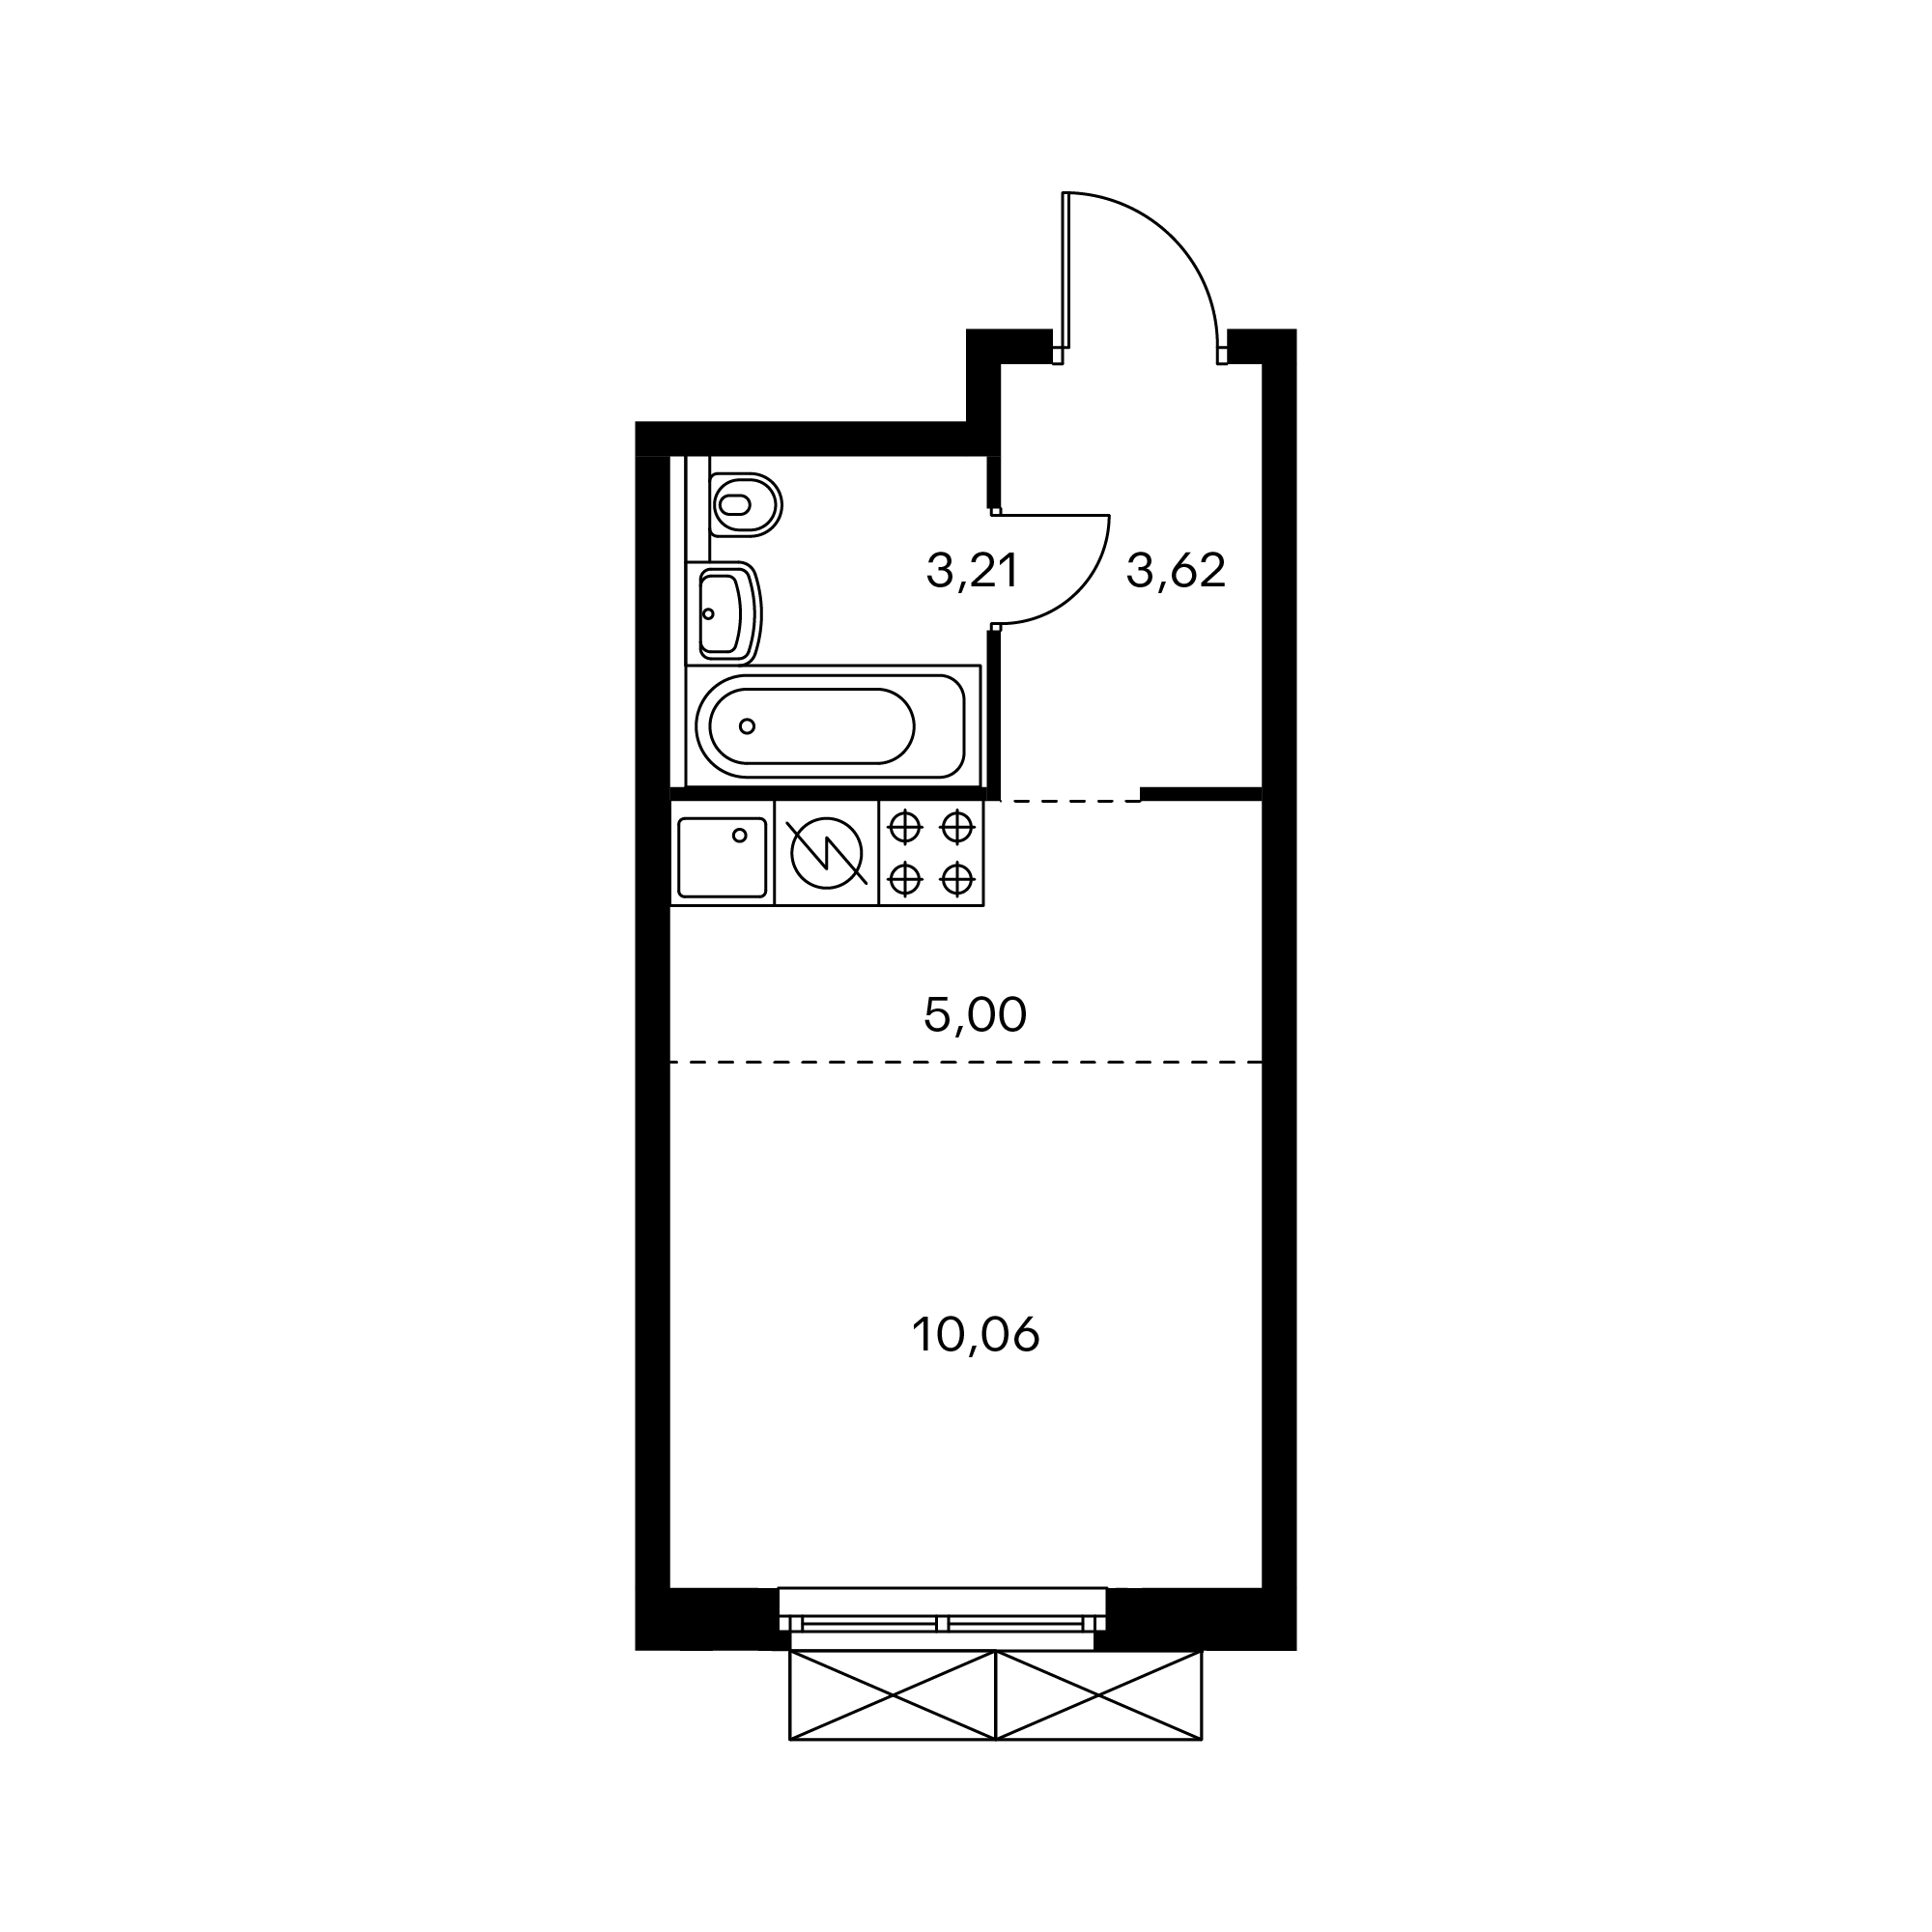 1NS1_3.6_3